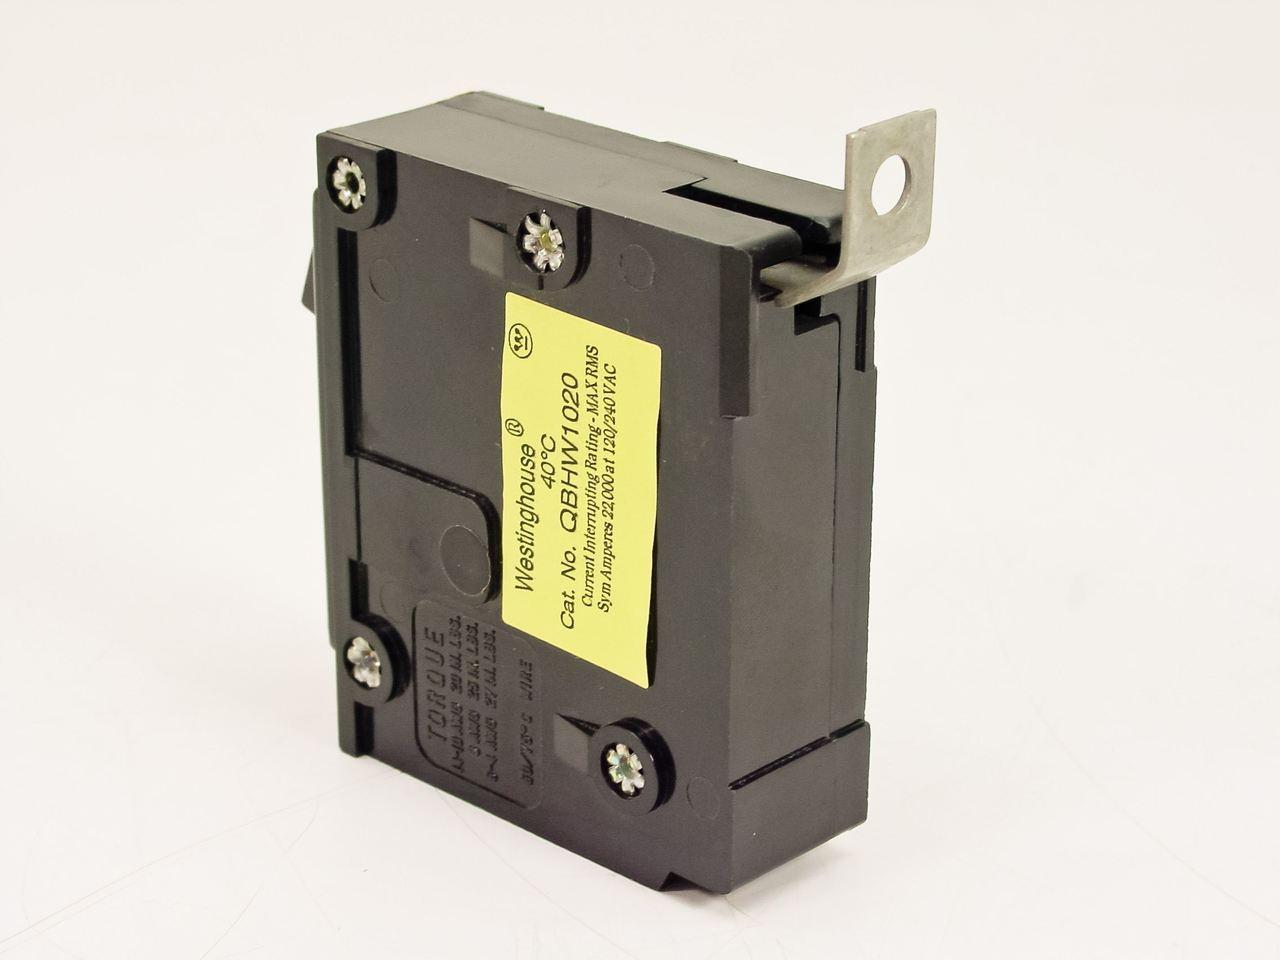 medium resolution of westinghouse 20amp circuit breaker qbhw1020 westinghouse 20amp circuit breaker qbhw1020